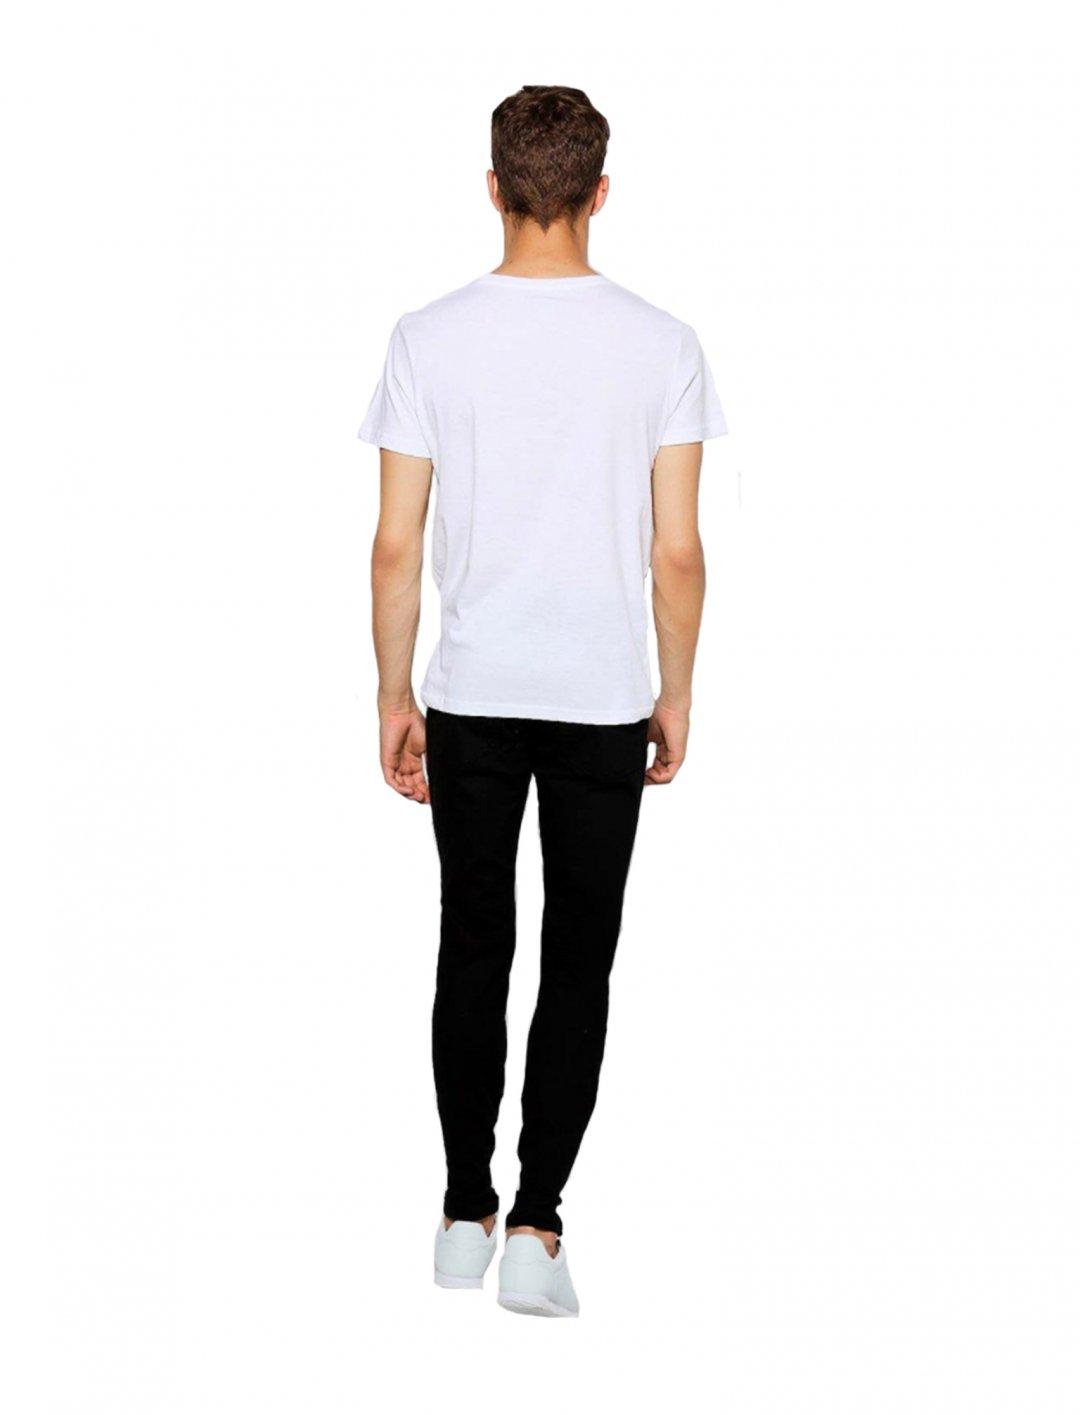 Stretch Skinny Jeans Clothing Boohoo